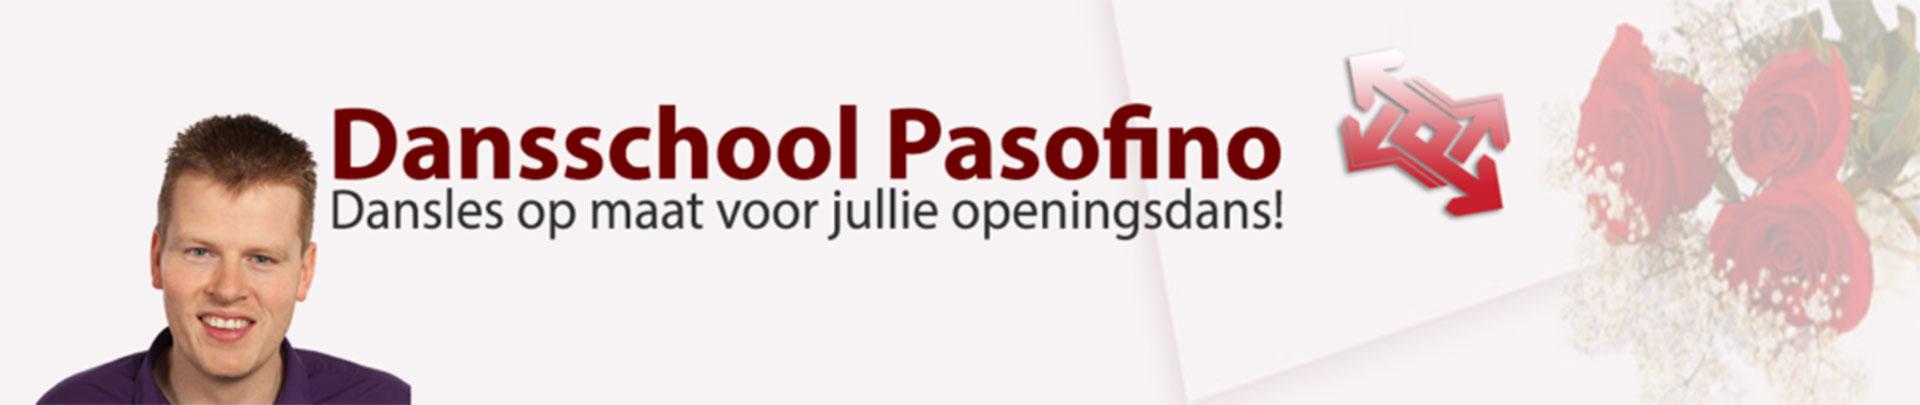 Dansschool Pasofino